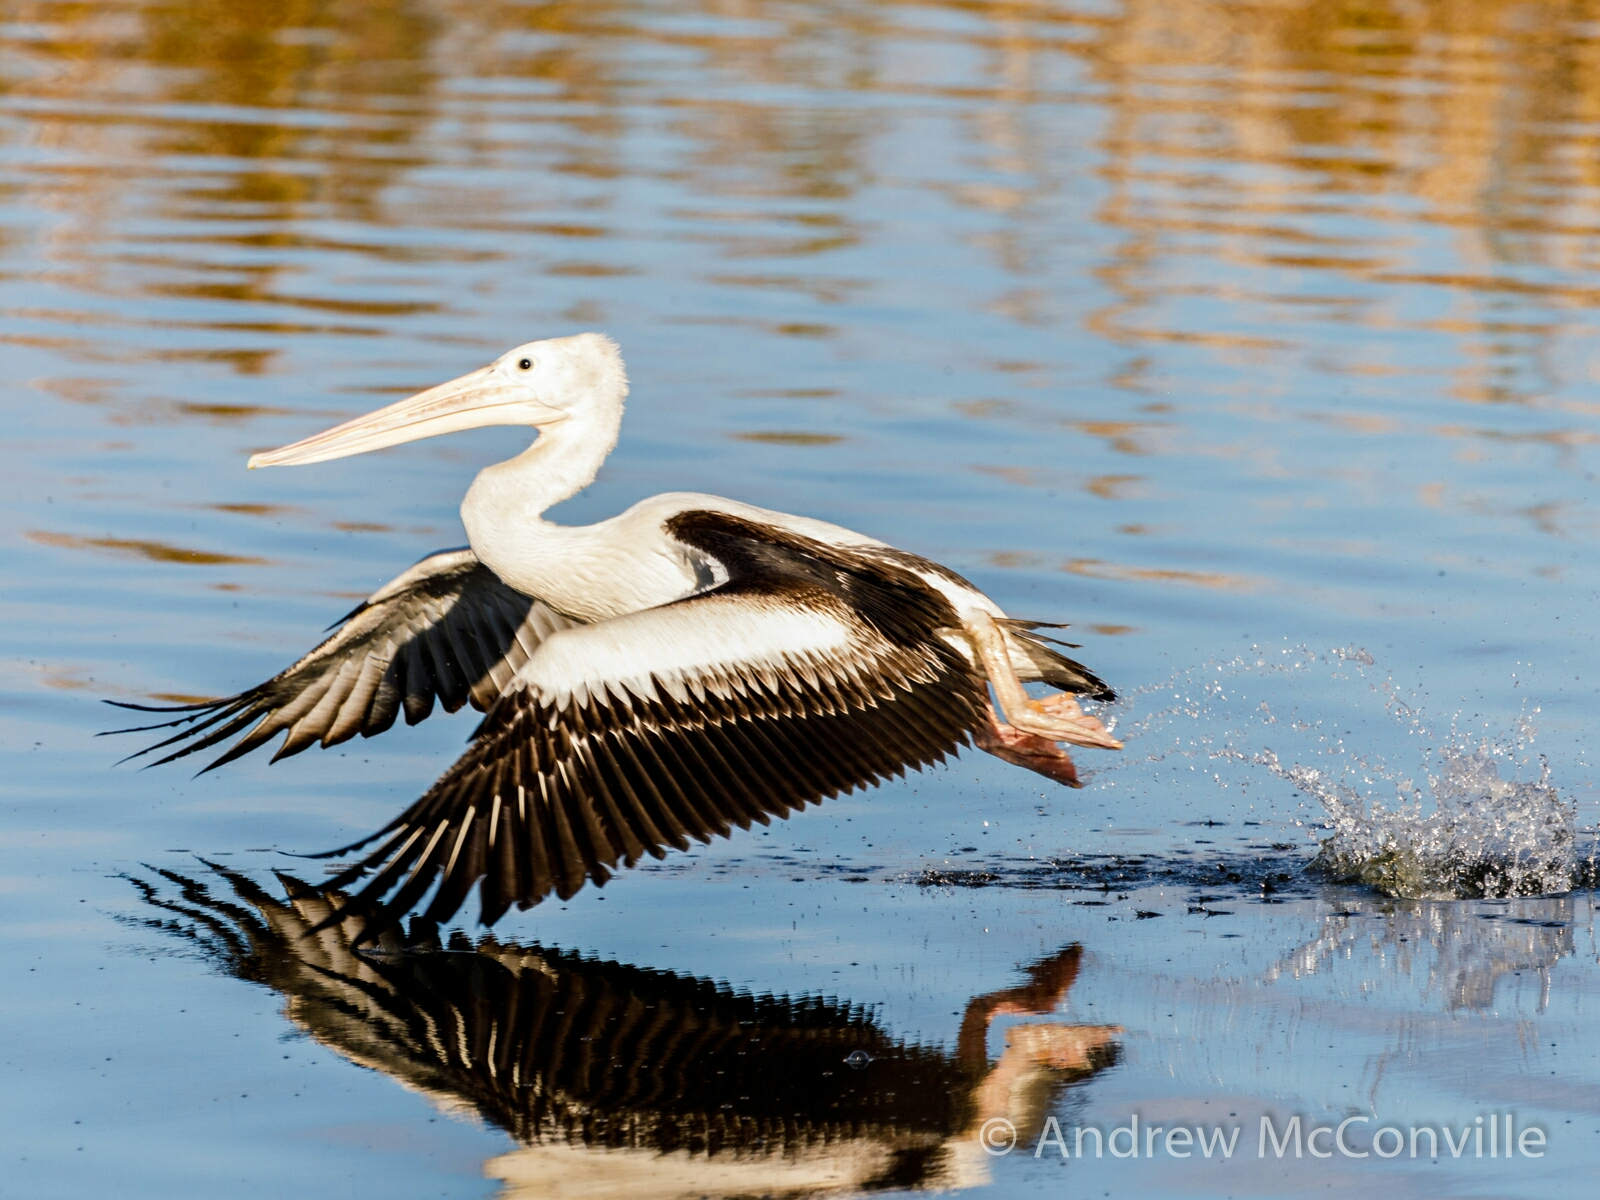 Image: Australian Pelican  (Pelecanus conspicillatus) by Andrew Mc,  CC BY-NC